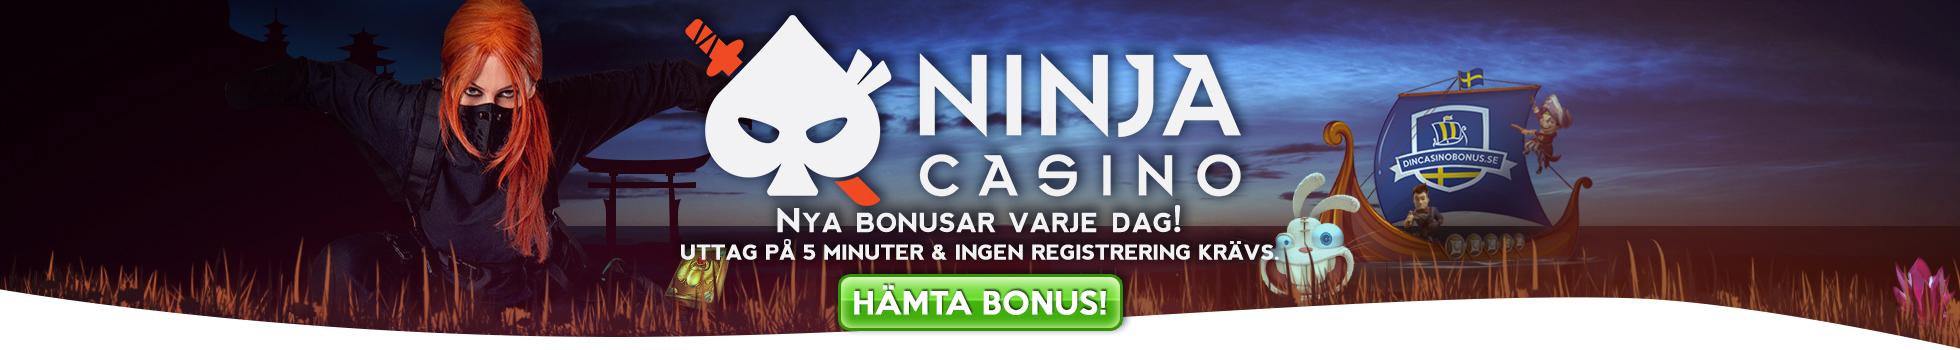 bästa casino bonus hos dincasinobonus.se